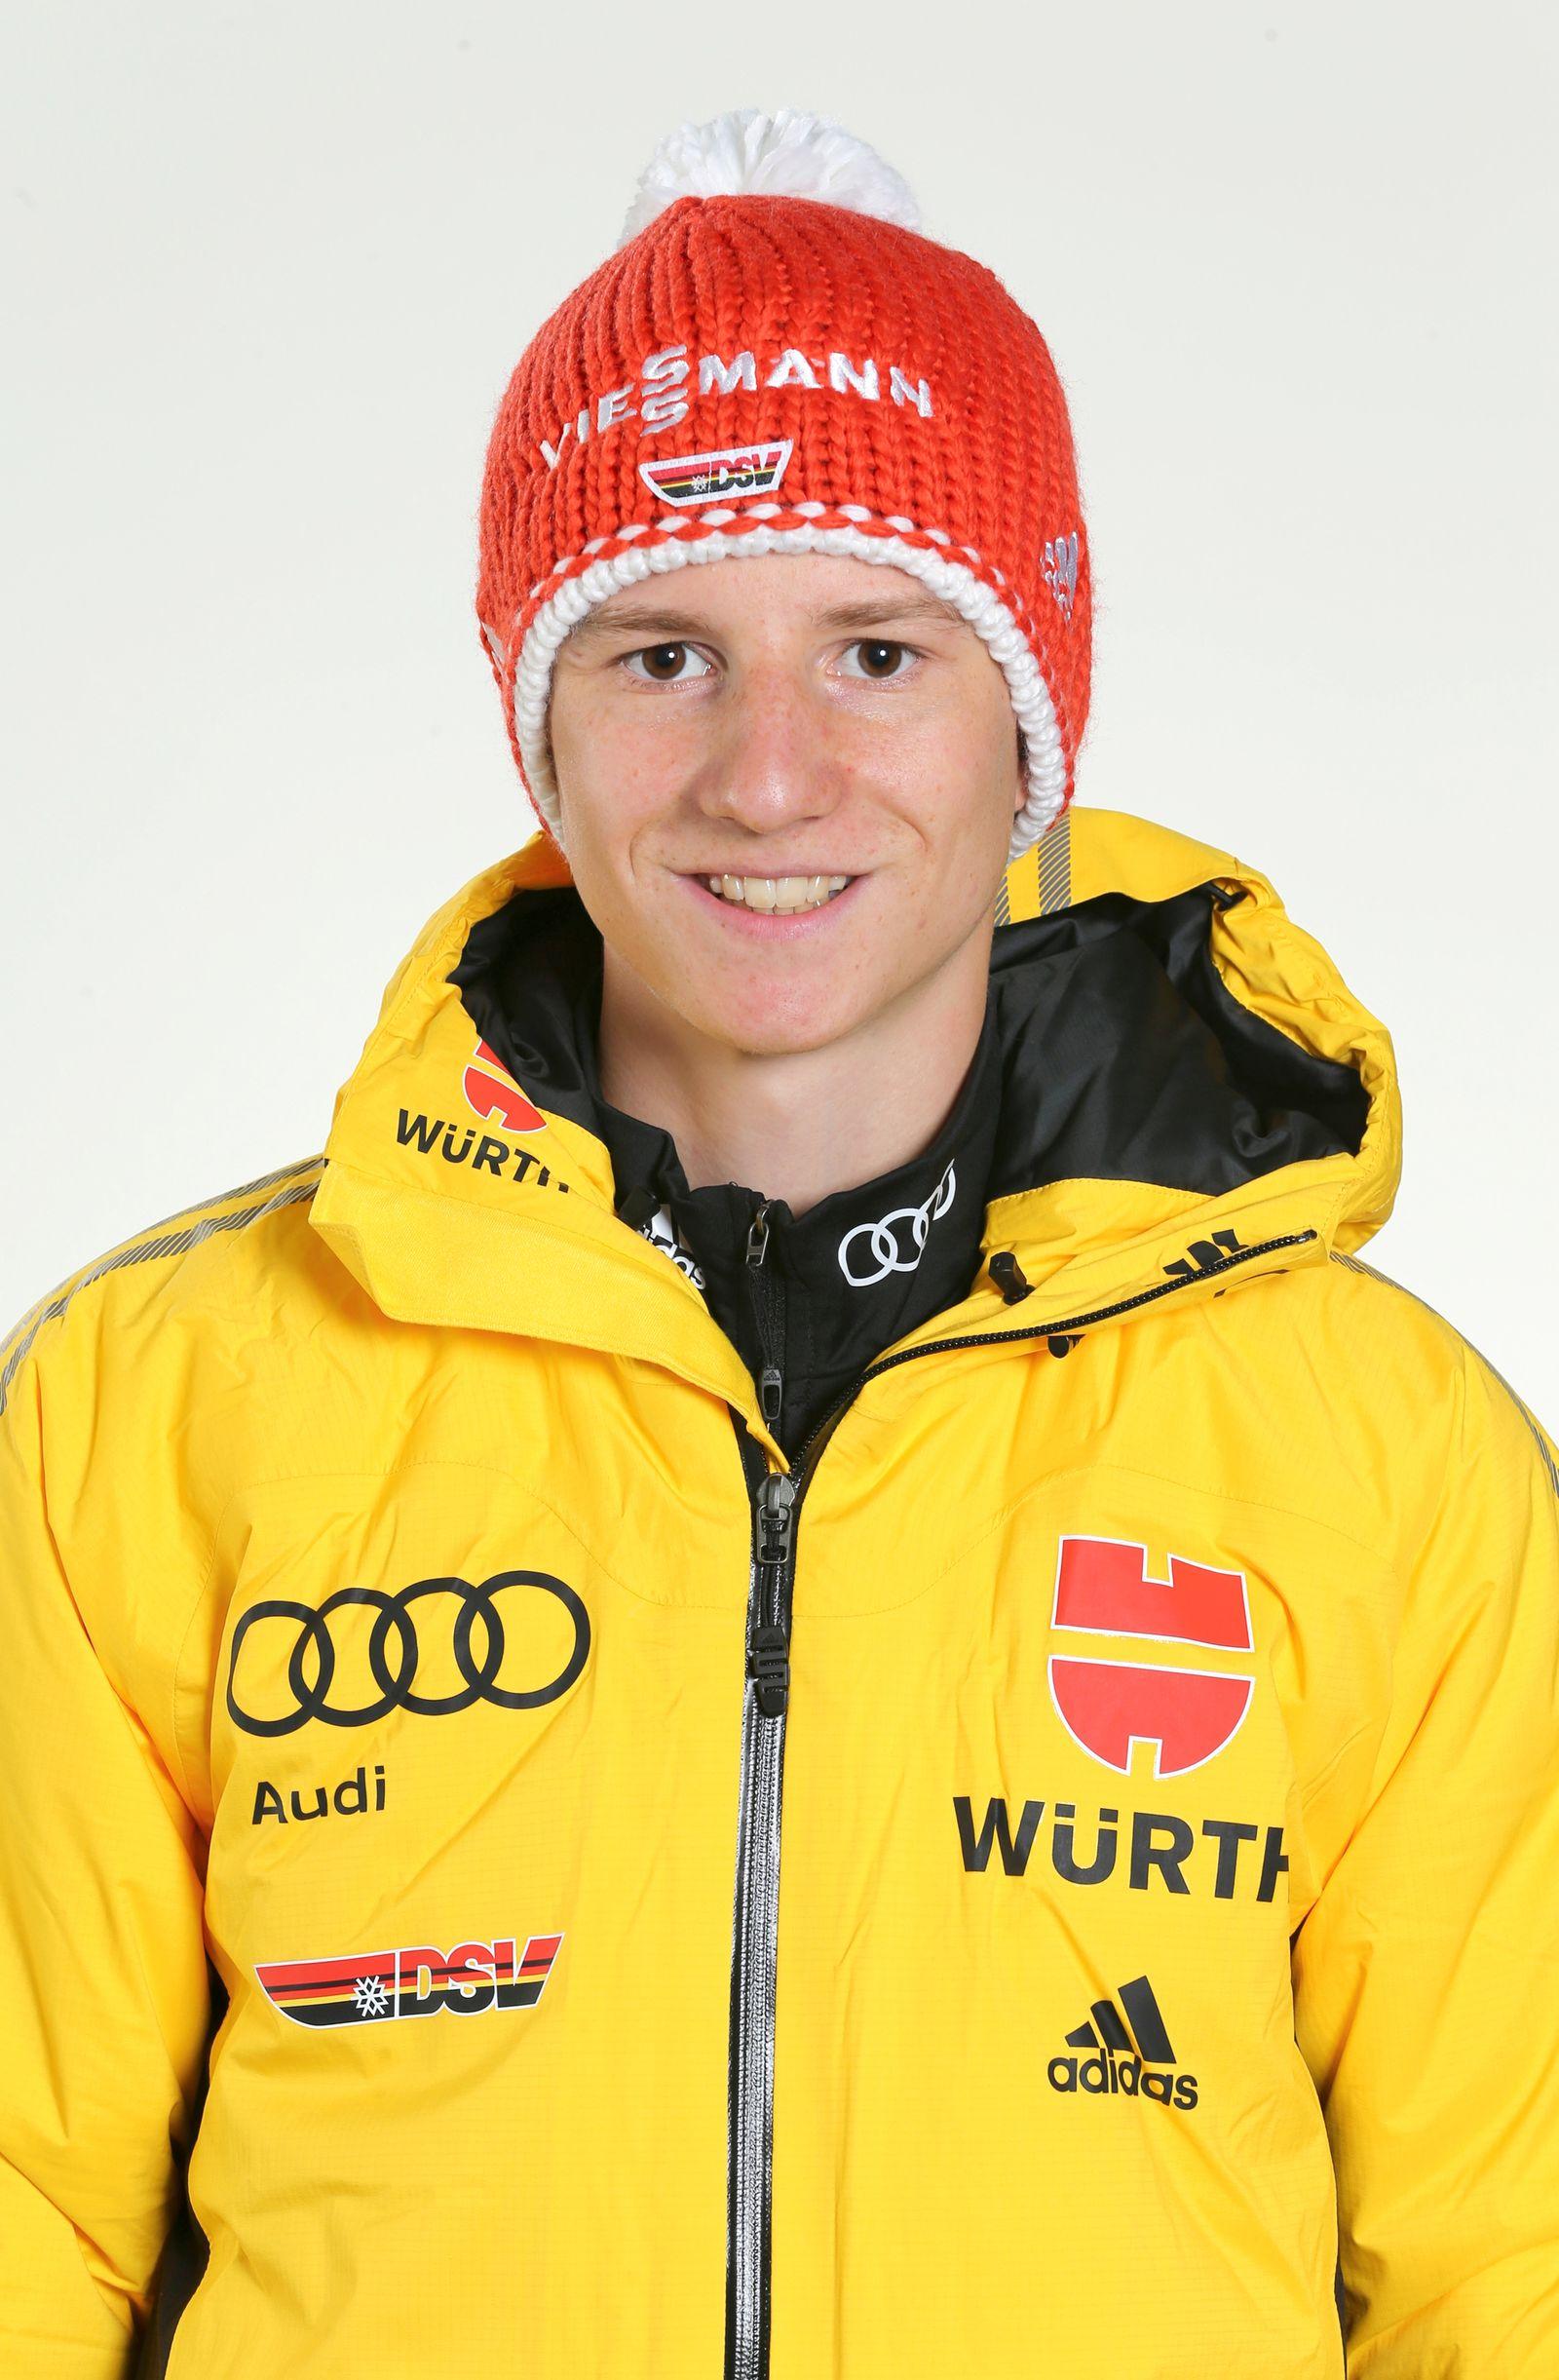 EINMALIGE VERWENDUNG Skispringer/ Karl Geiger